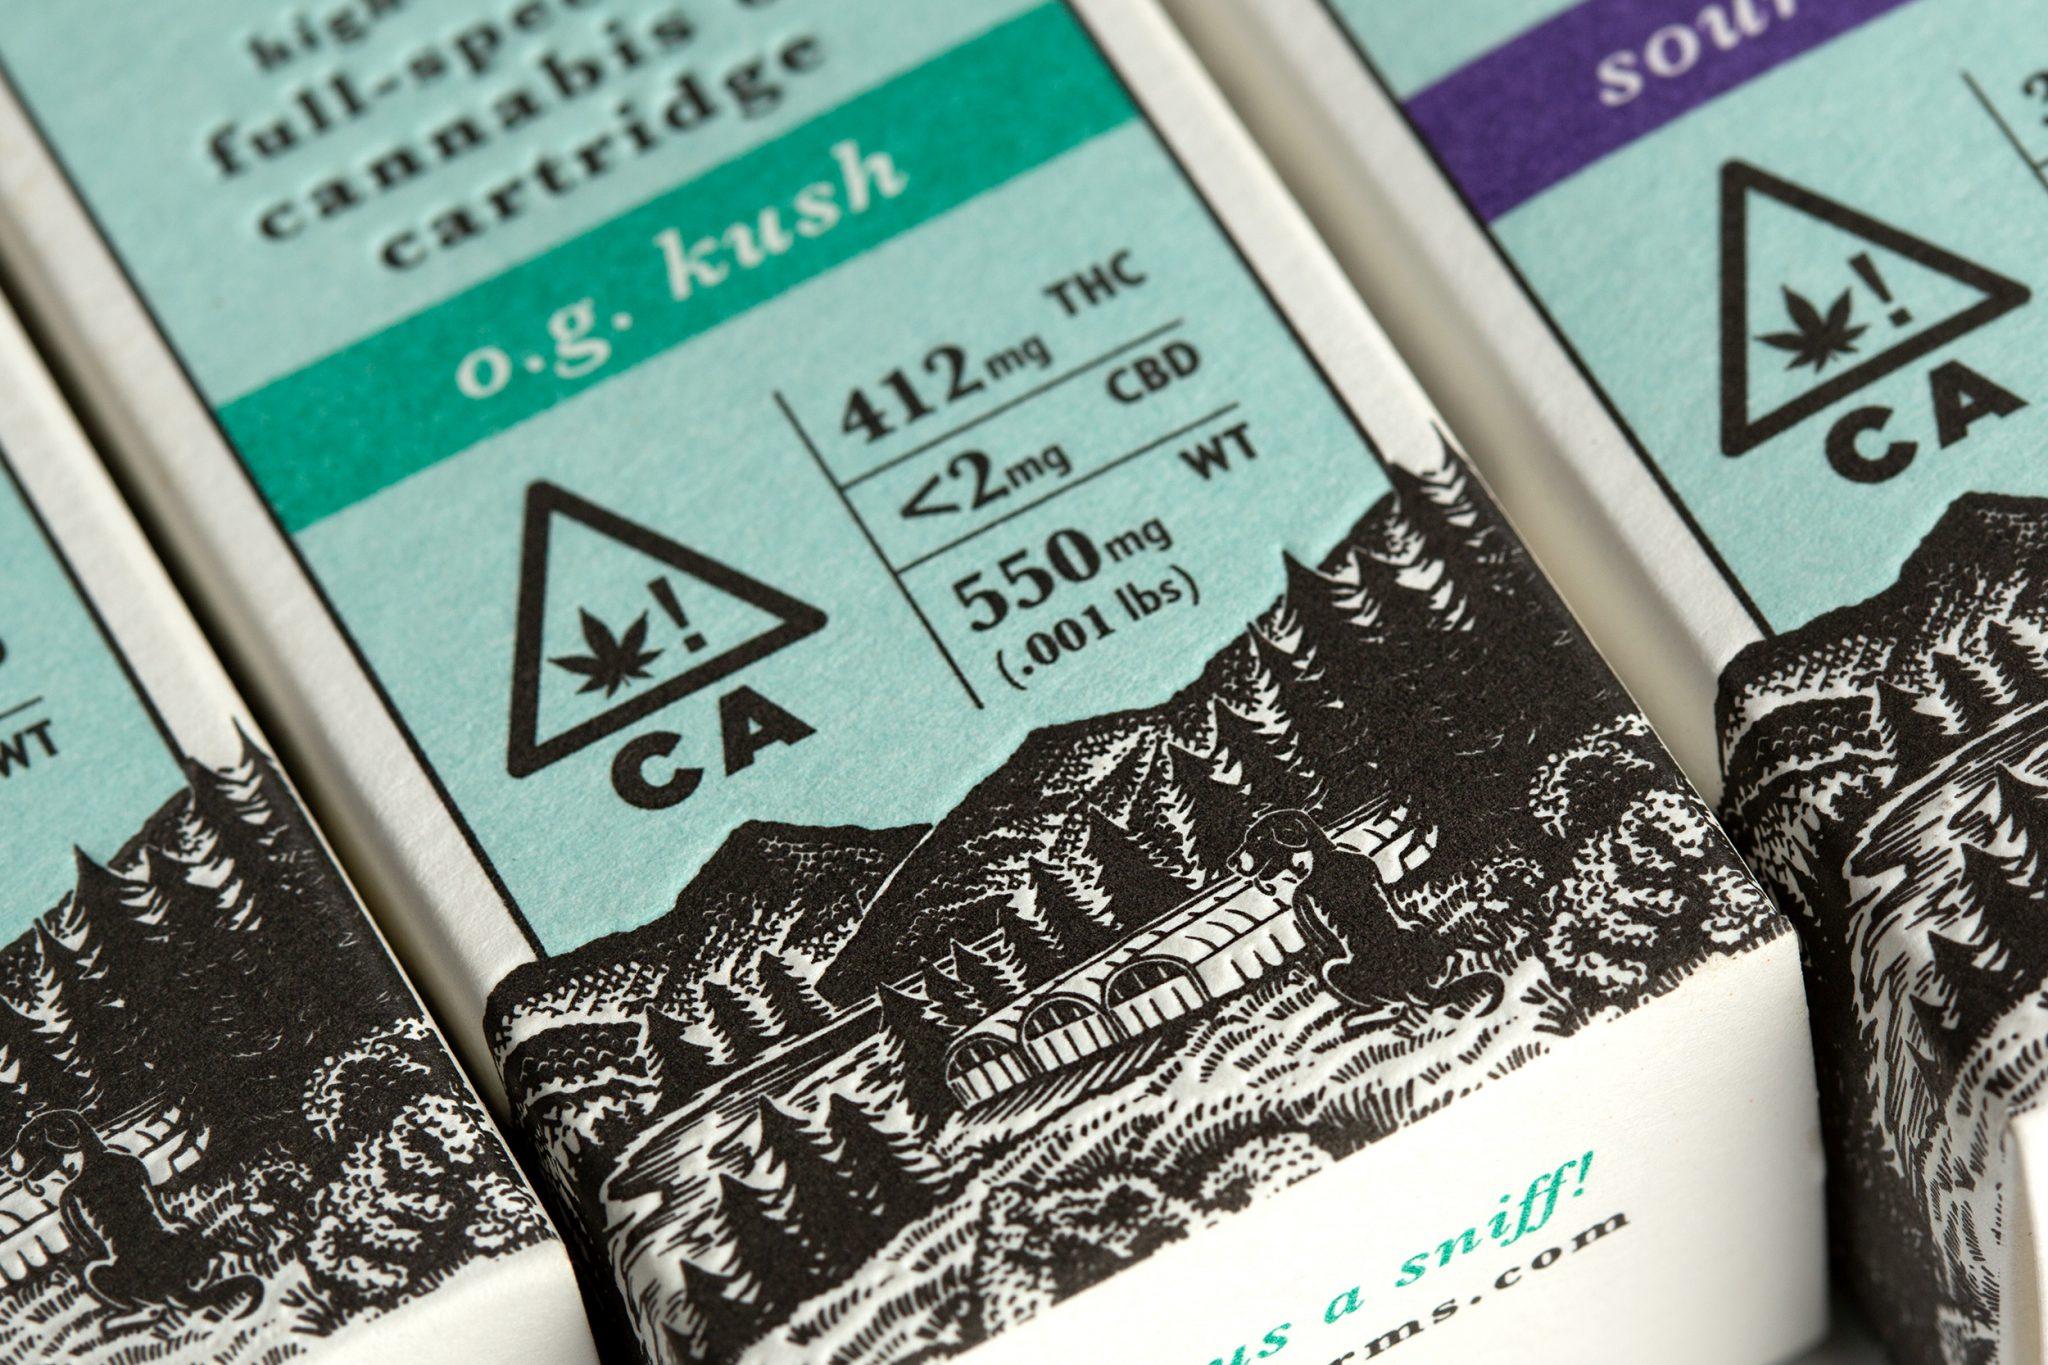 Barrett Farms Humboldt County High Spectrum Cannabis Oil Cartridge Compliant Packaging Design by Vertical in Santa Rosa, CA